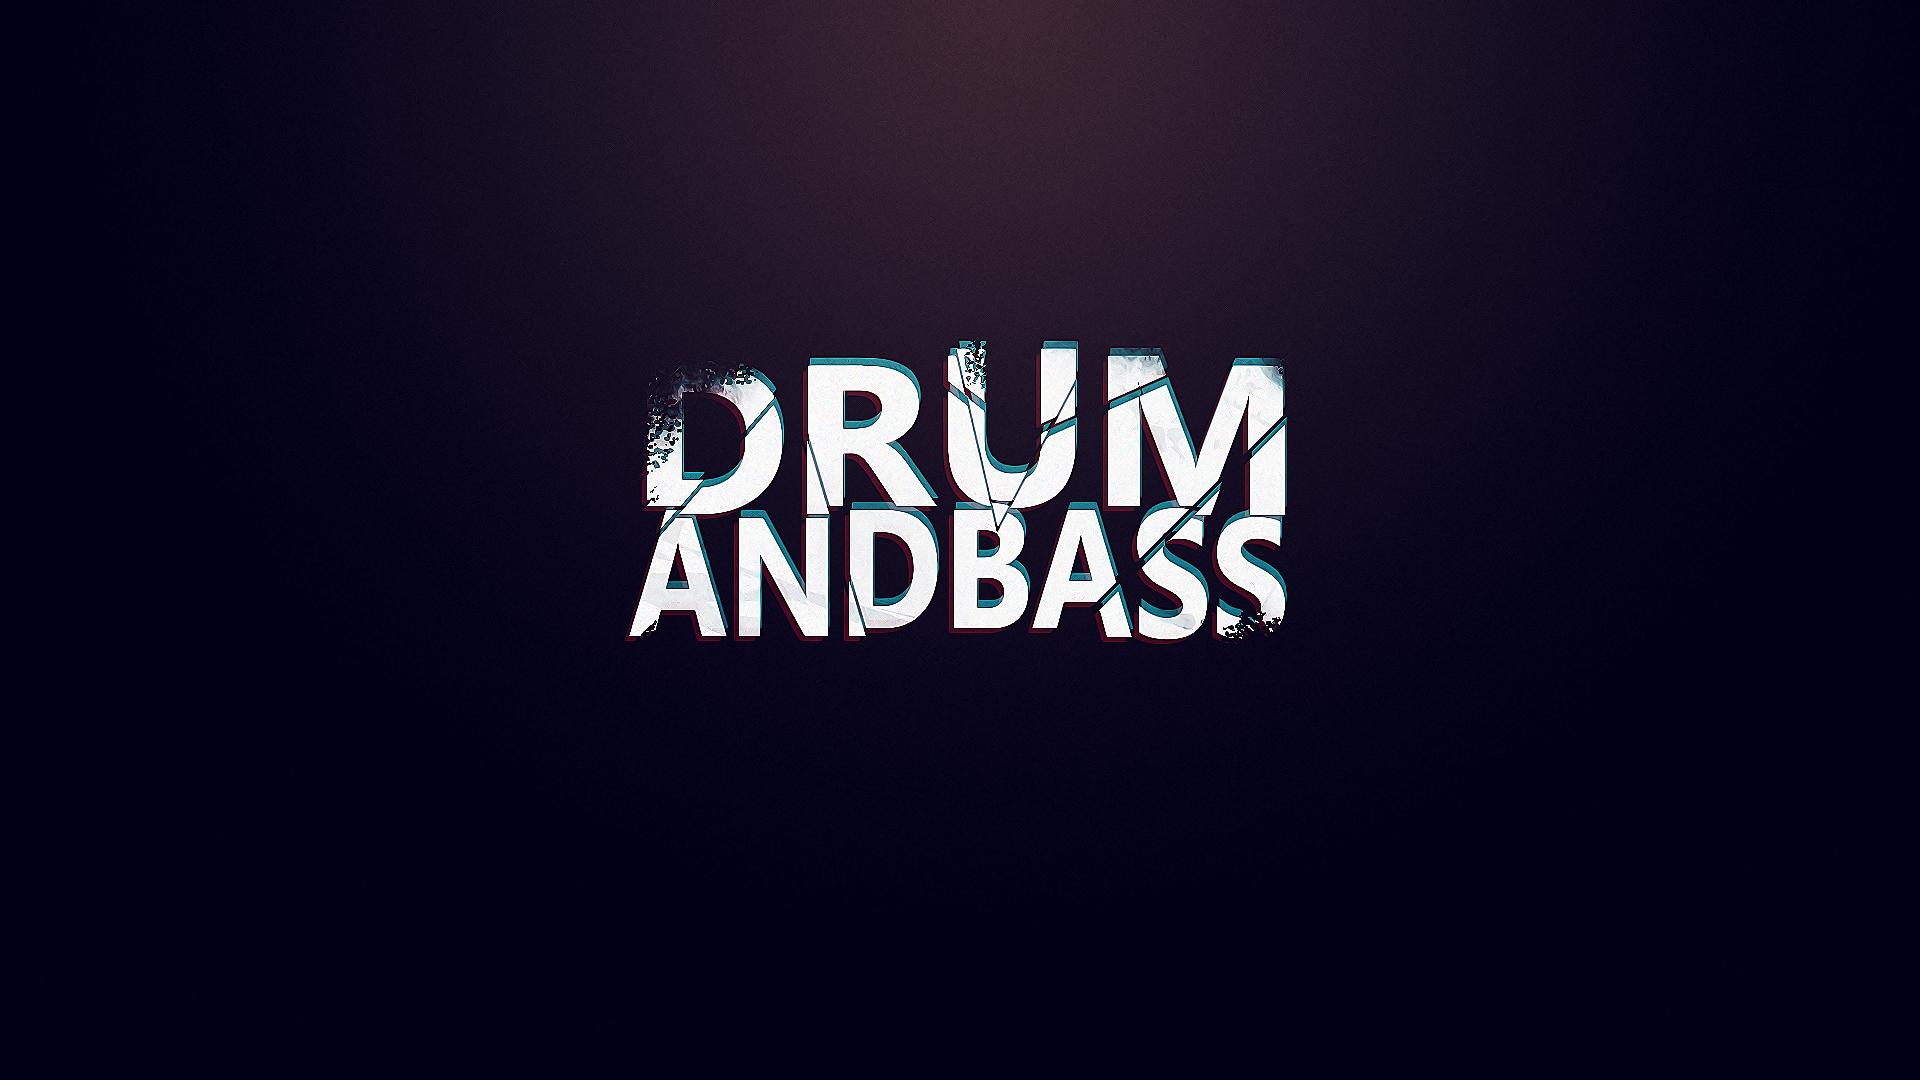 drum n bass фото: